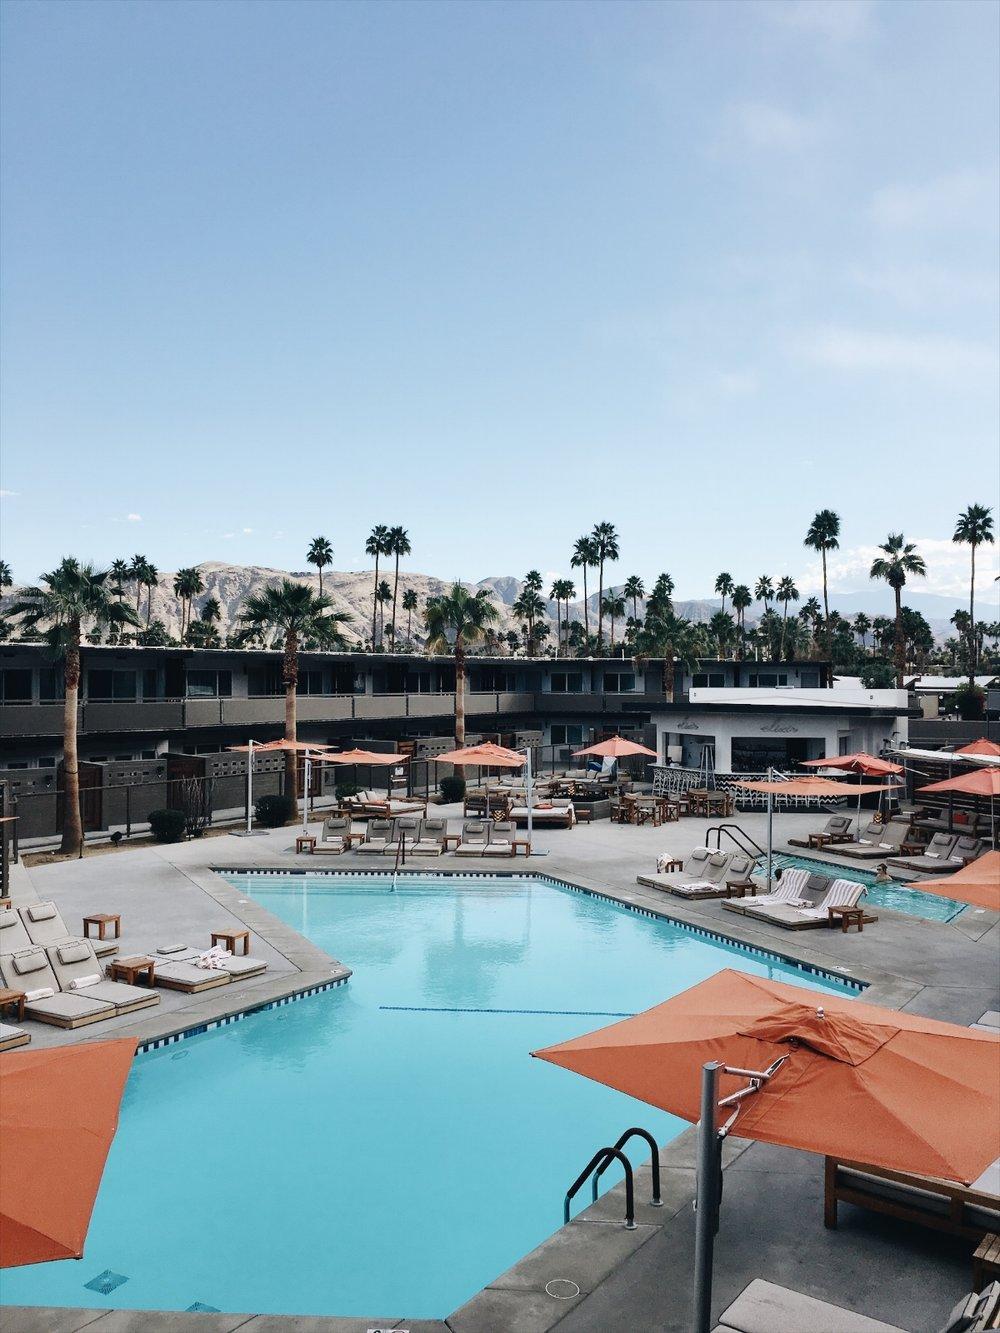 1baee-seesoomuch_v_palm_springs_hotel_pool.jpg